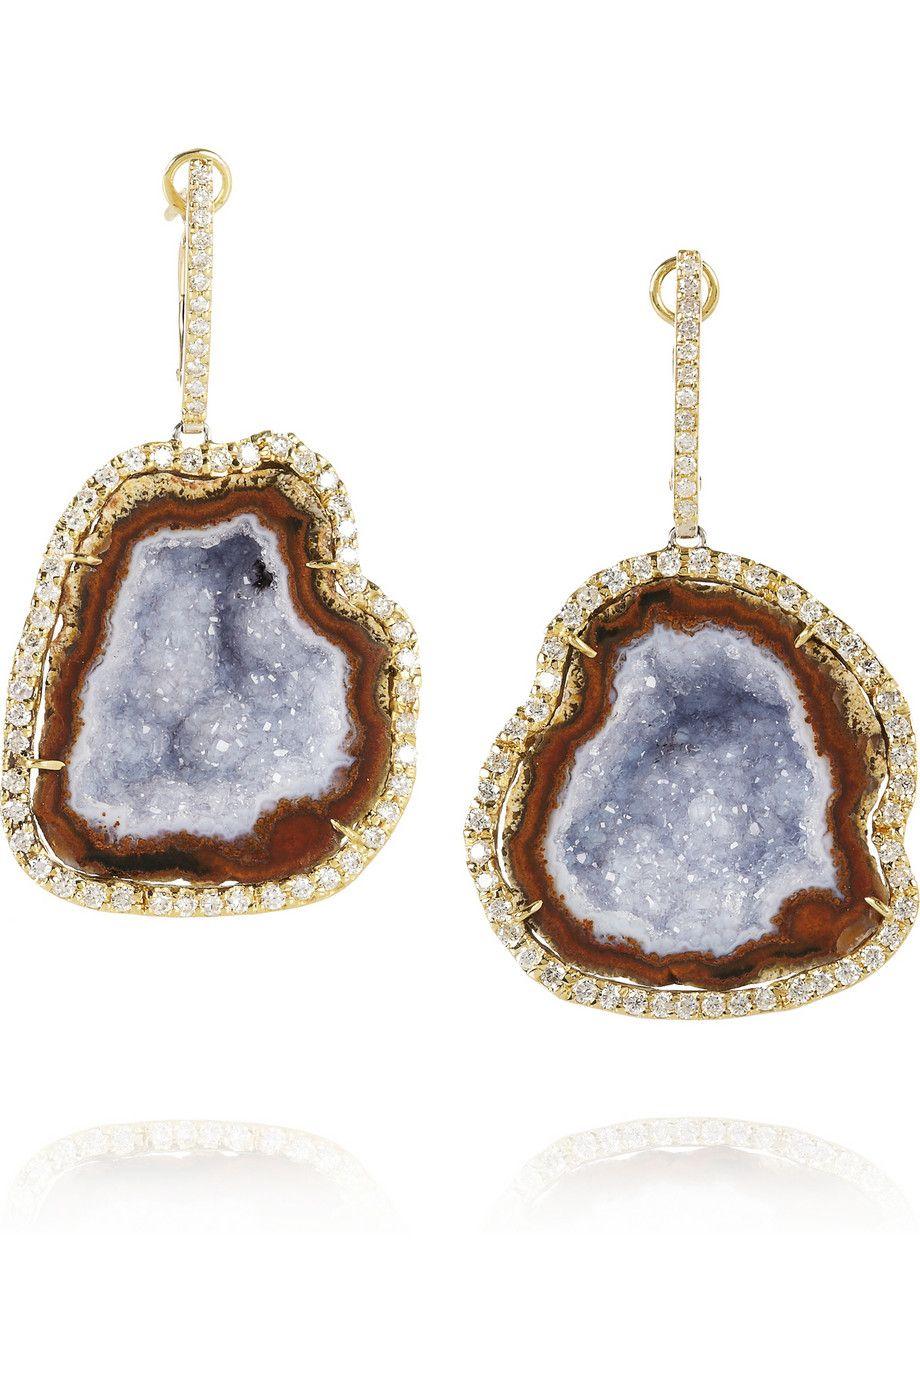 18K Gold Diamond and Blue Geode Earrings Kimberly McDonald aVgOorE